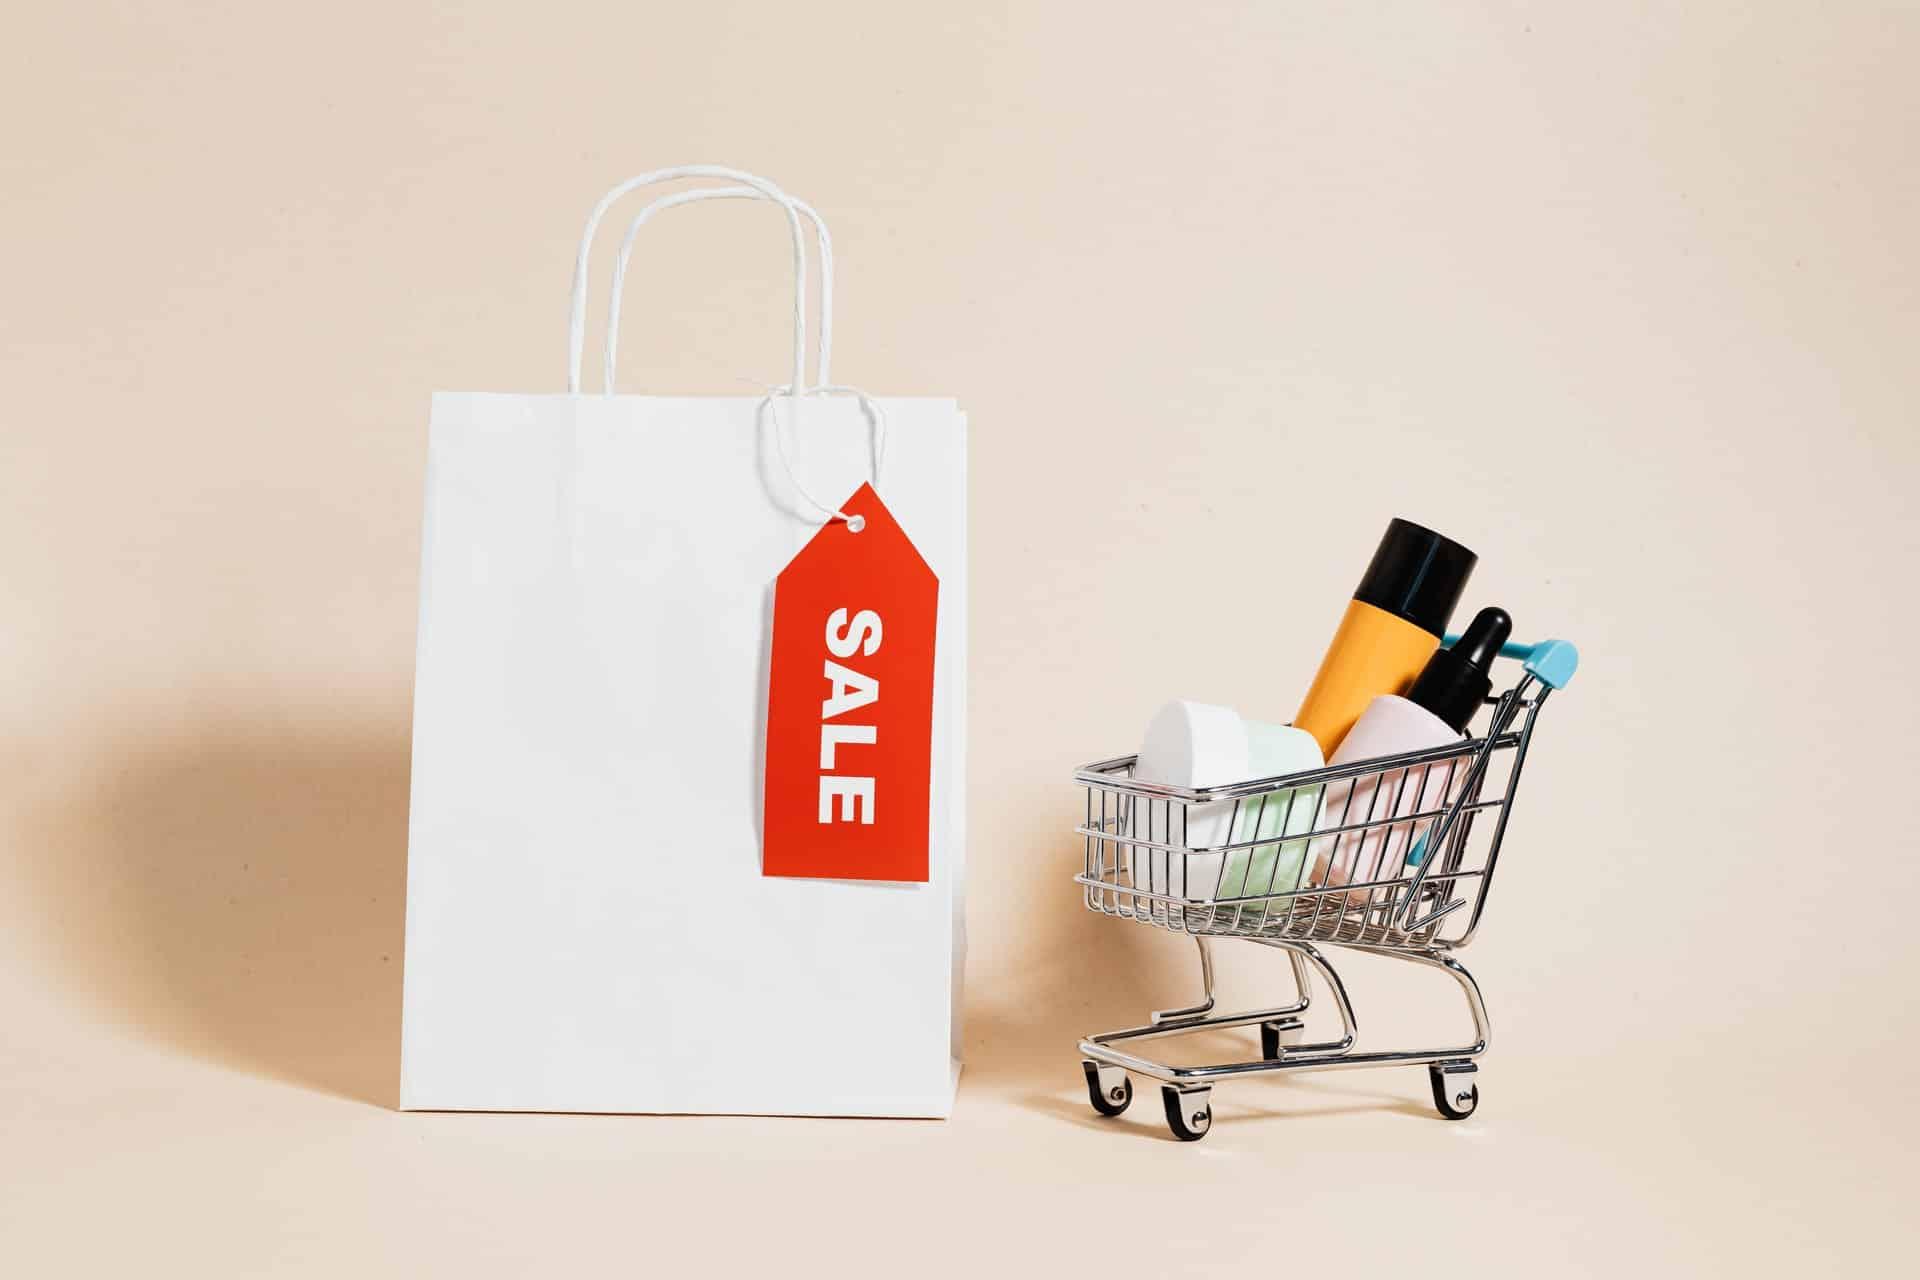 compras online compras en internet ecommerce e-commerce